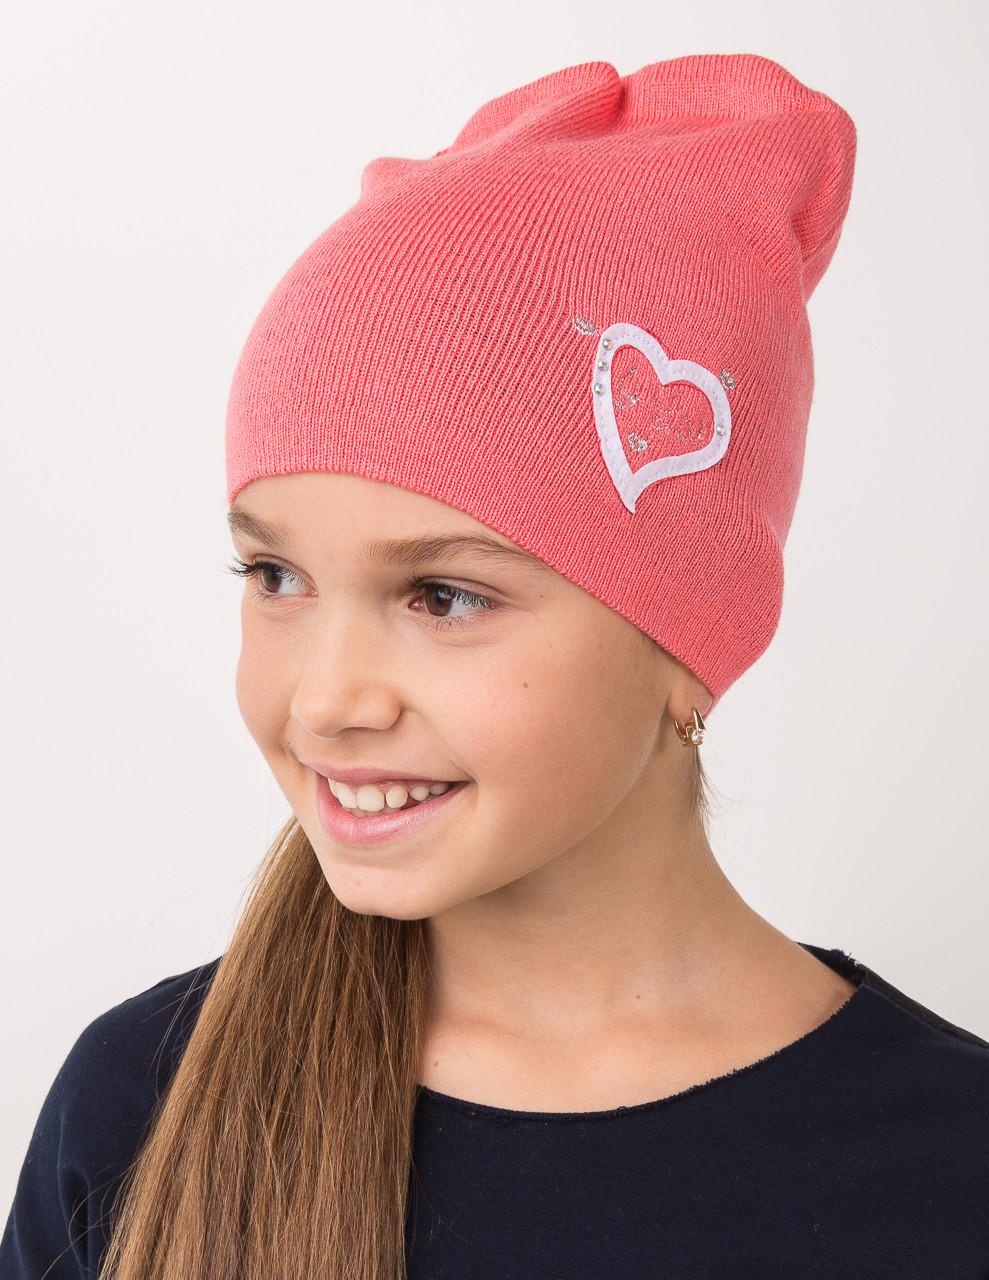 Шапка для девочек на осень 2018 оптом - LOVE - Артикул 2106